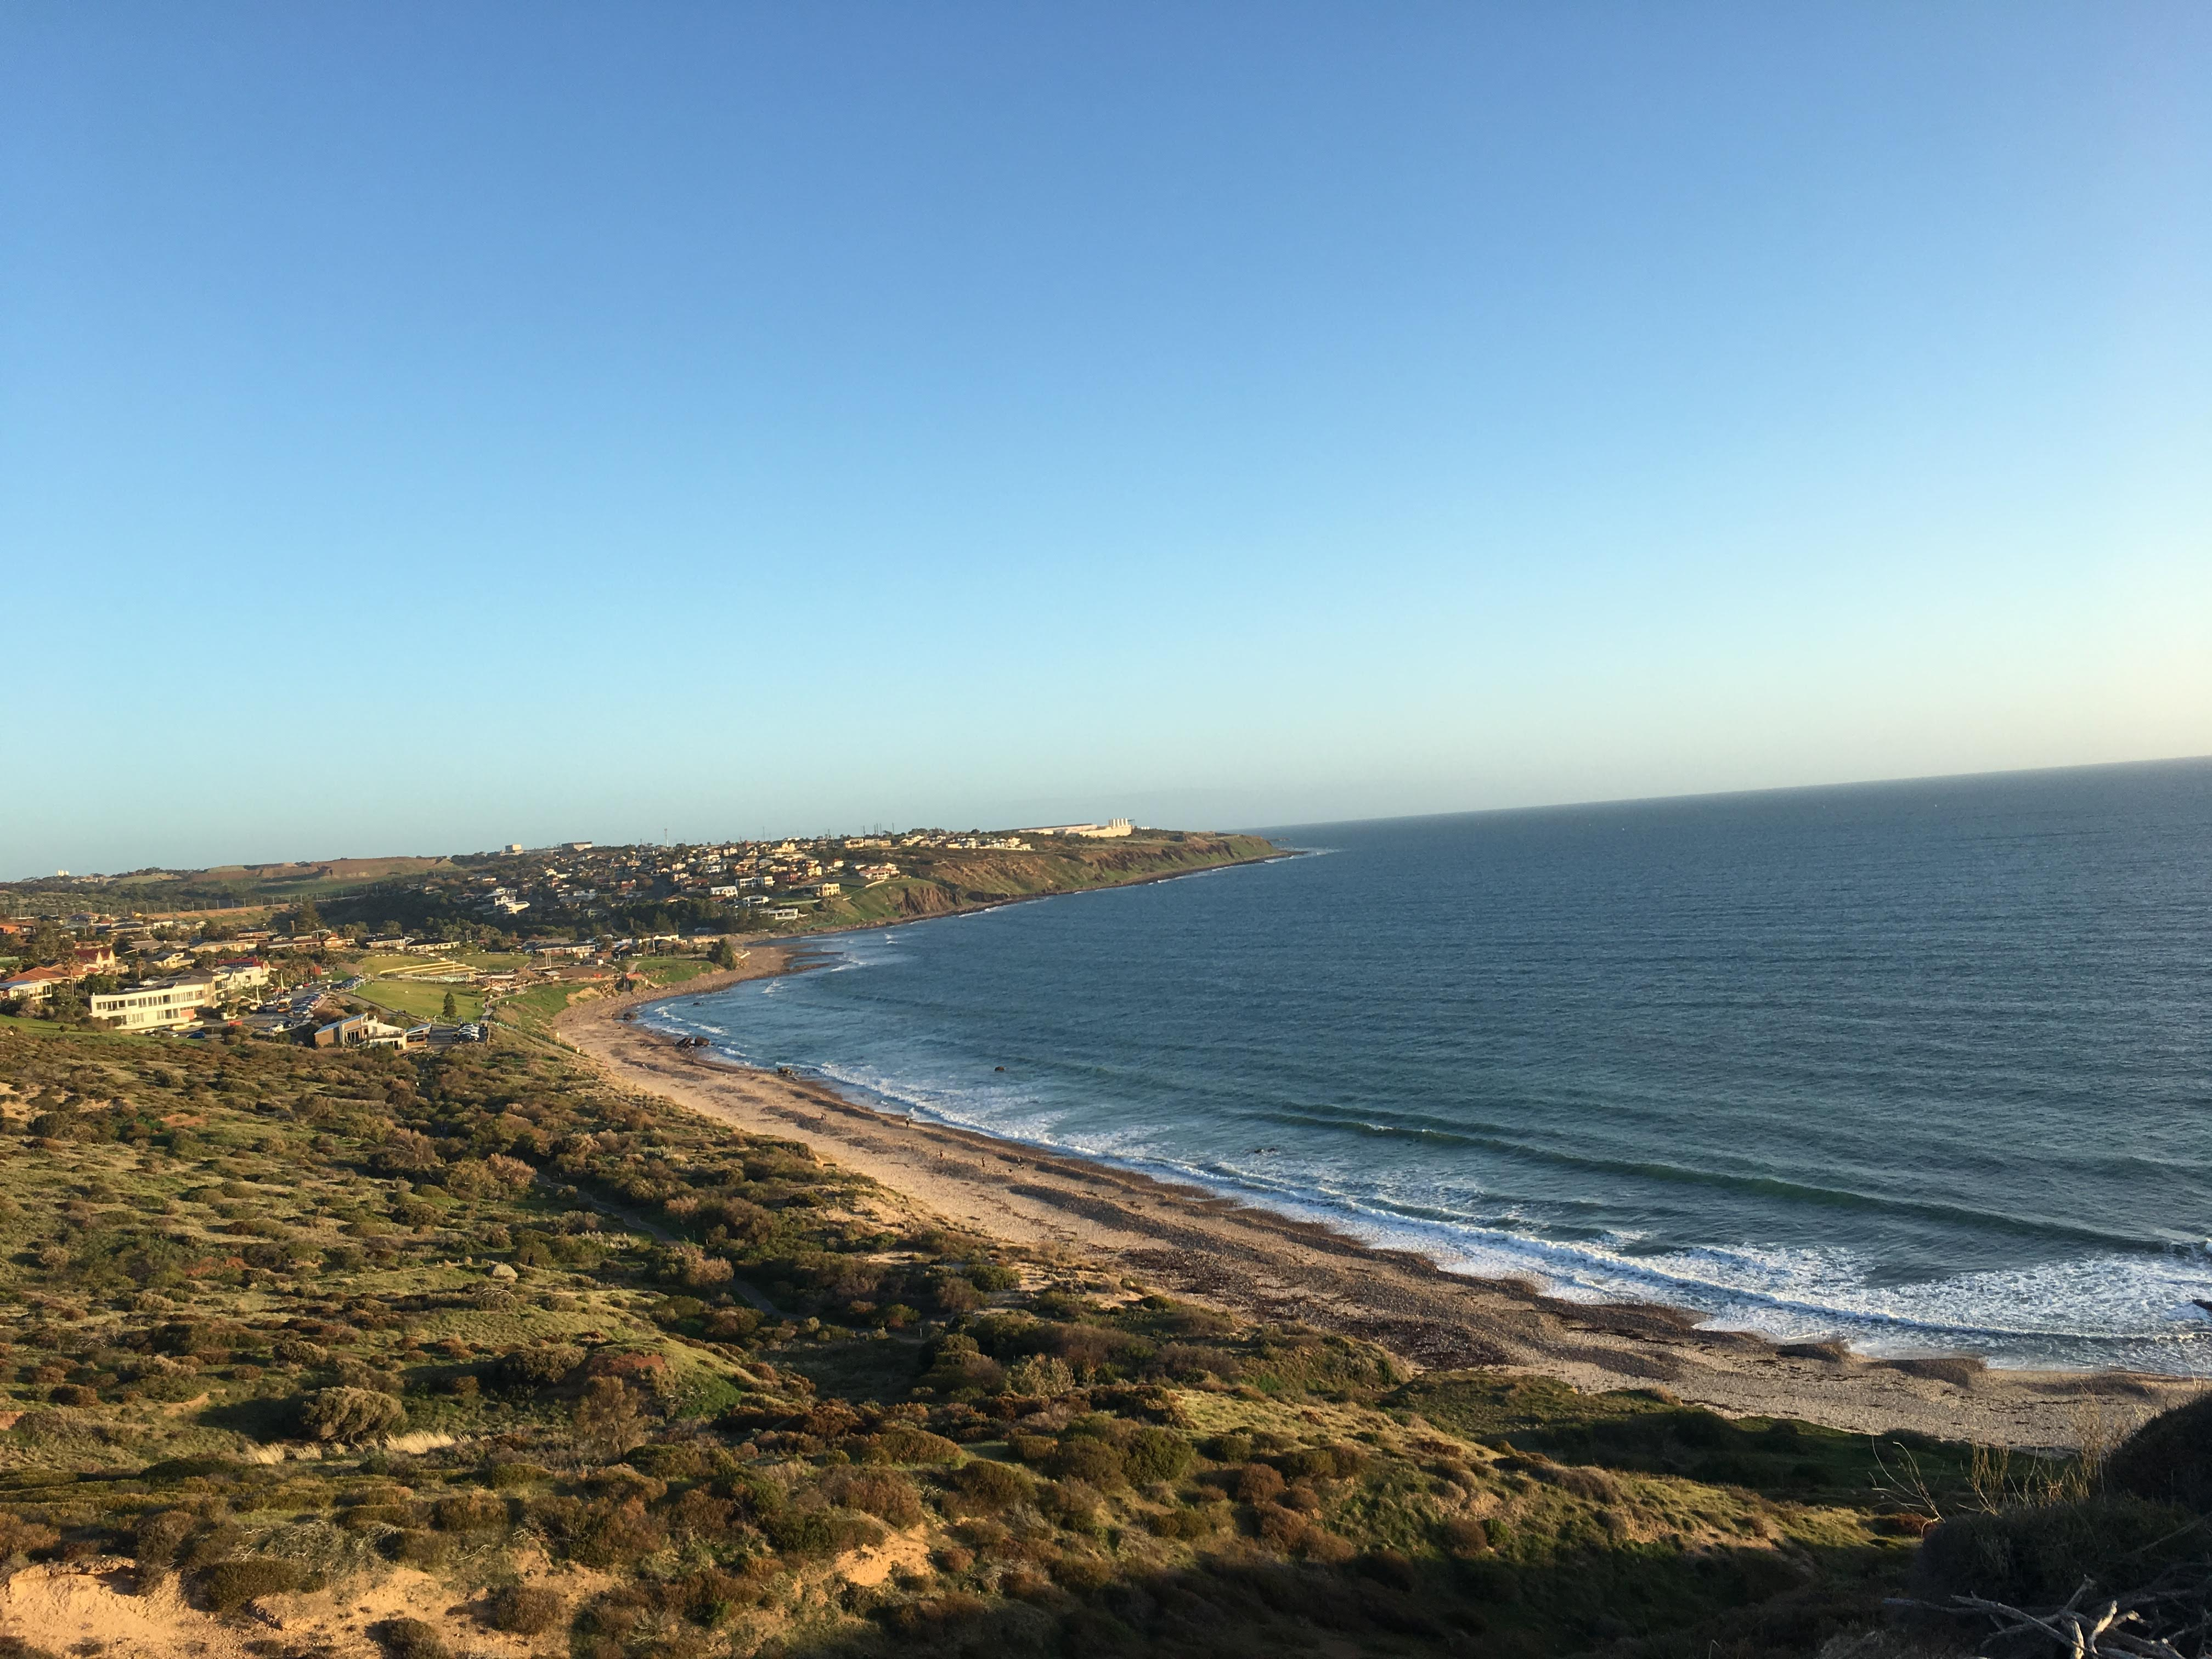 Hallet Cove Beach, SA